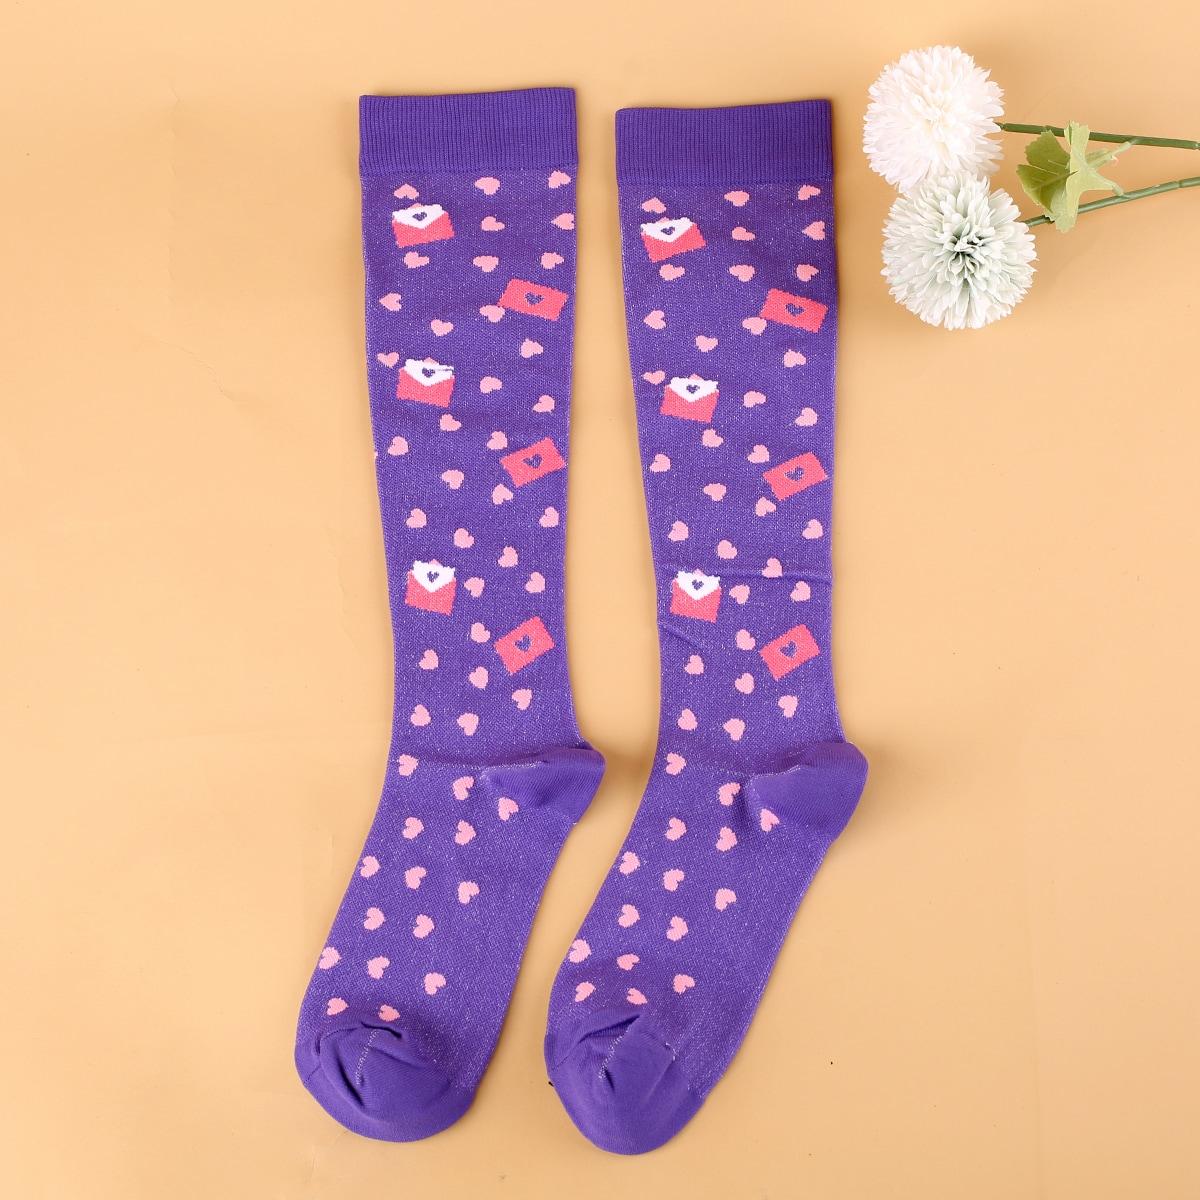 Носки выше голени с принтом сердечка